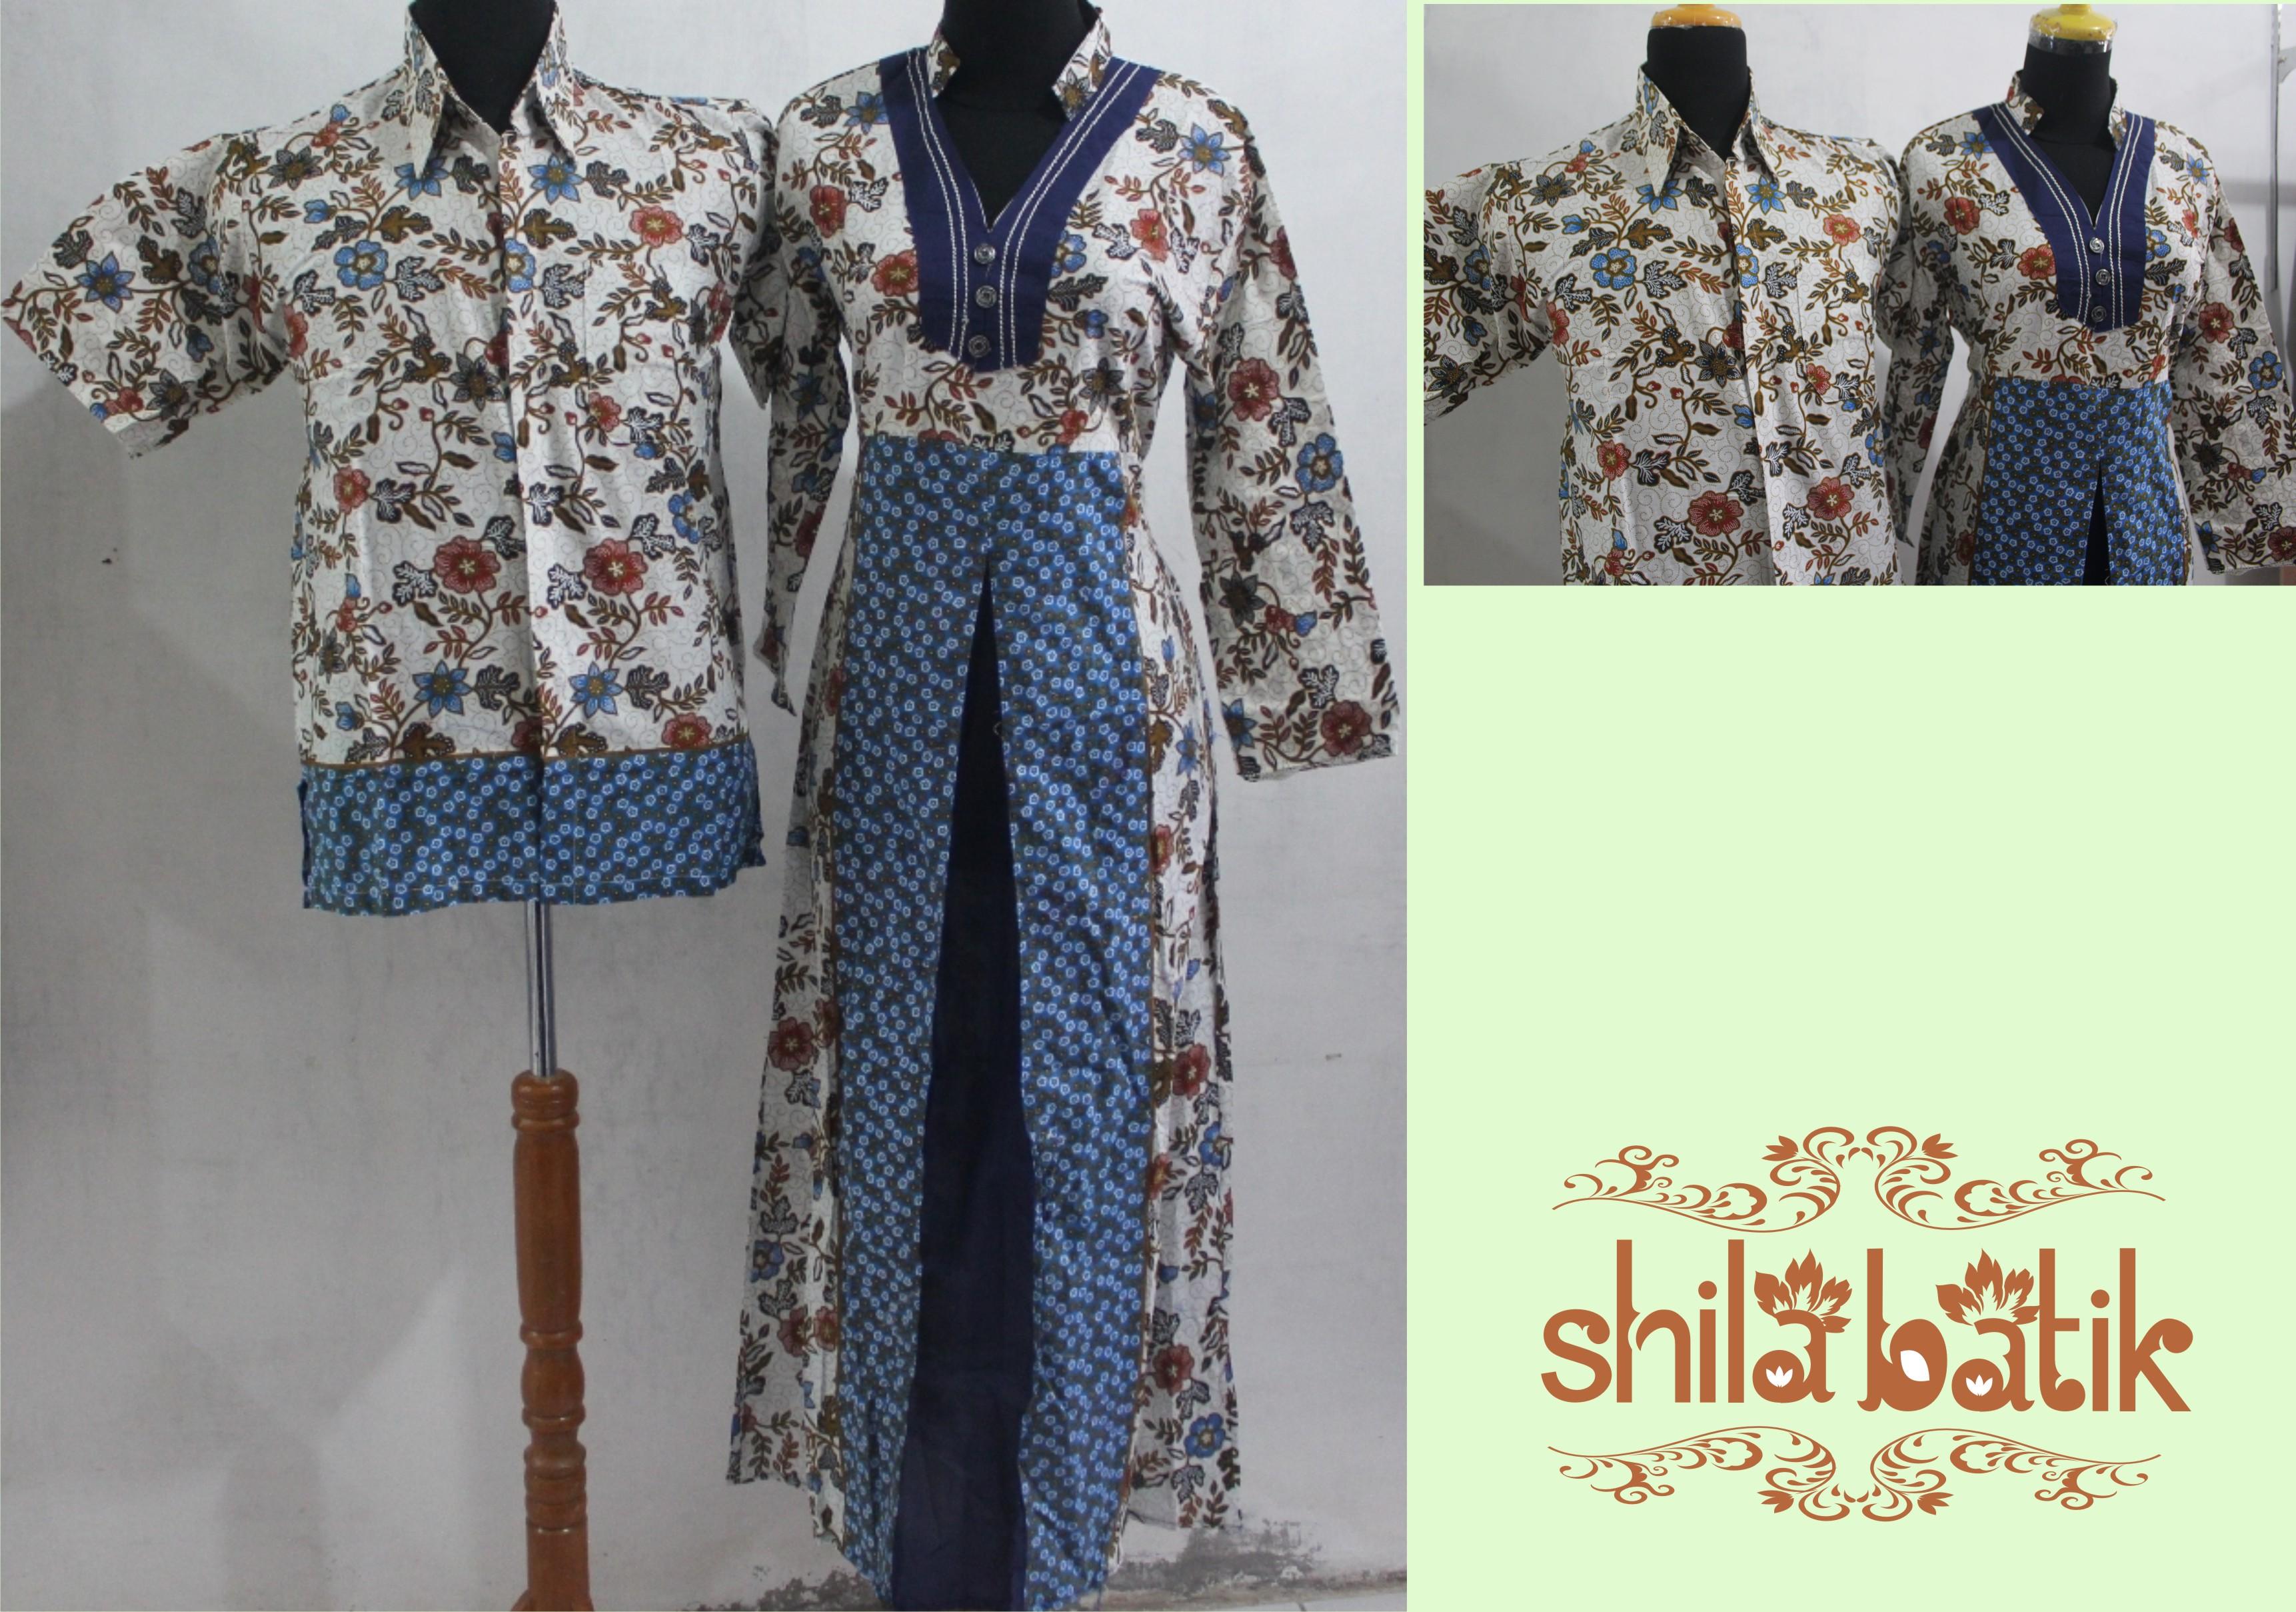 Katalog Sarimbit Catalog of Couple Batik  jual batik online